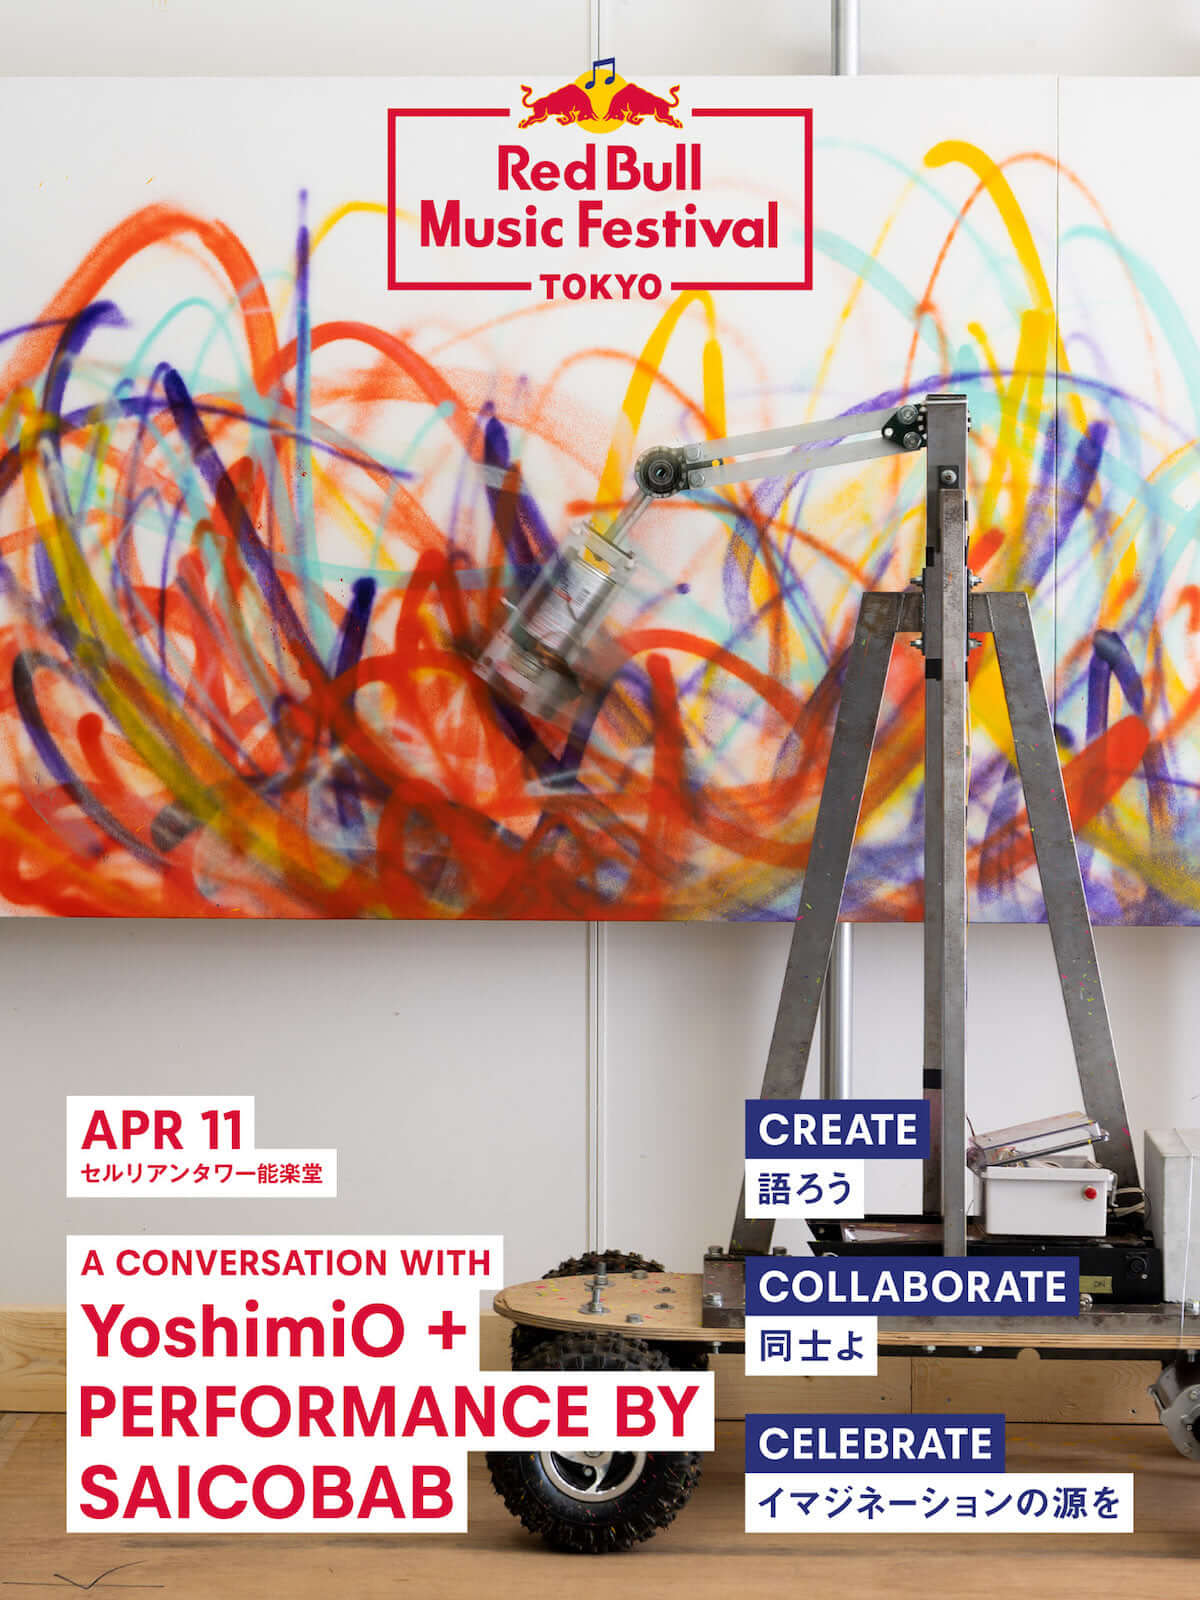 Boredoms・YoshimiOが初めて語る音楽観とは?レッドブル主催イベントが能・狂言で著名なセルリアンタワー能楽堂で開催 redbull-a-conversation-with-yoshimio-190322-1200x1600